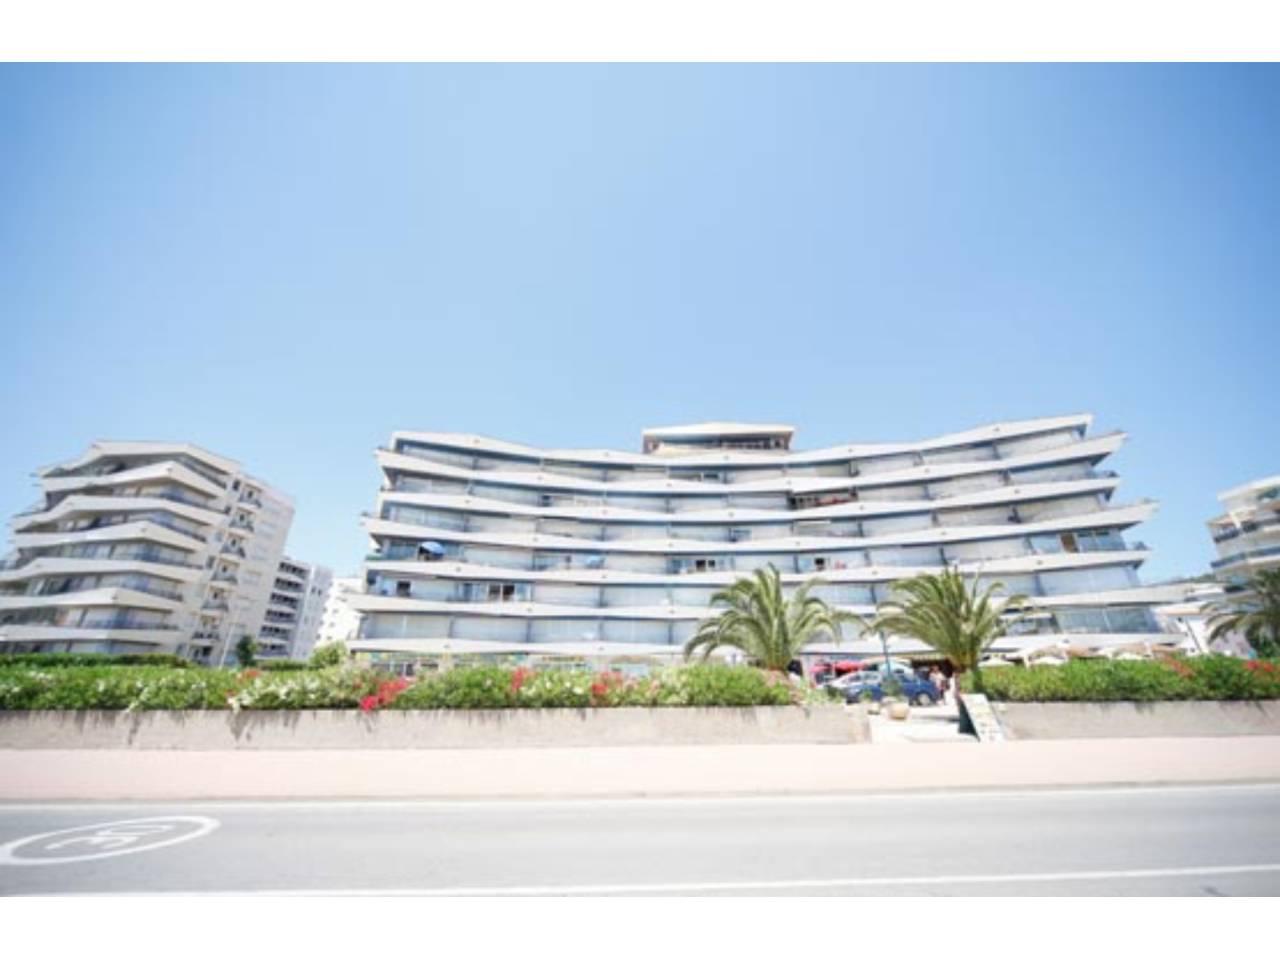 Local Comercial  Paseo maritim edif. catalonia. Local comercial ubicado en un edificio de viviendas del nucleo d